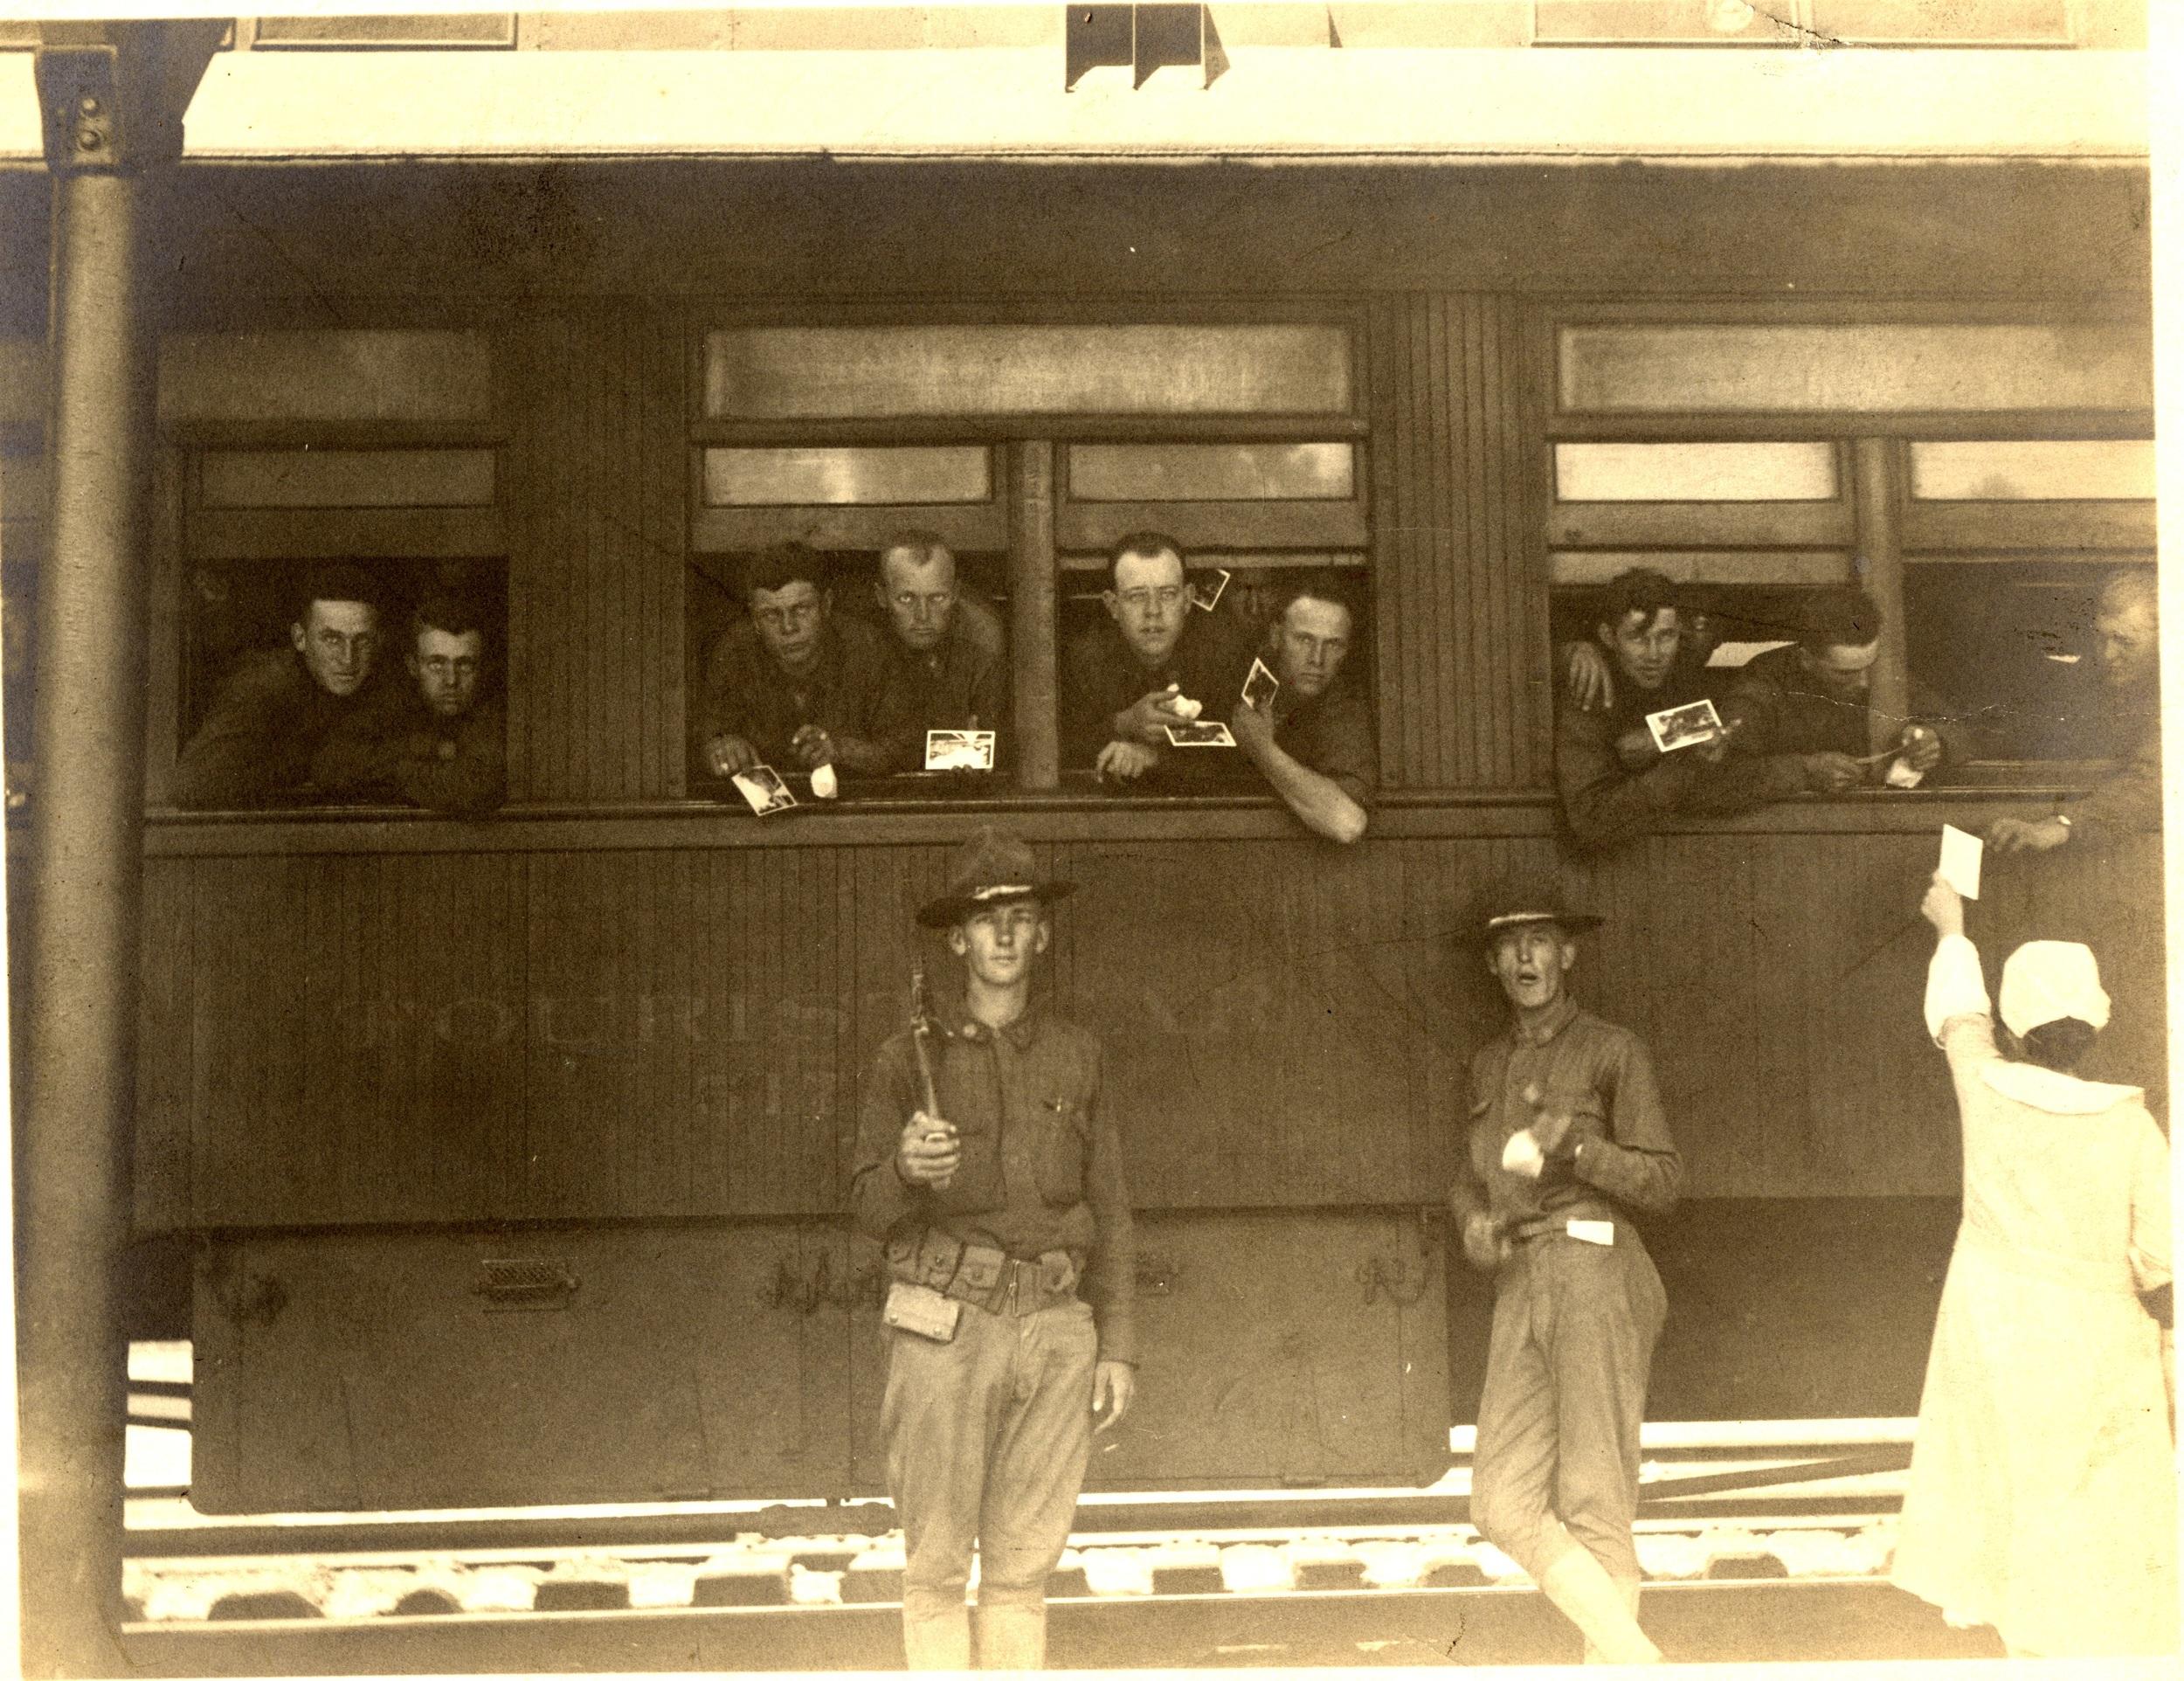 Troop Train at Kemper Station